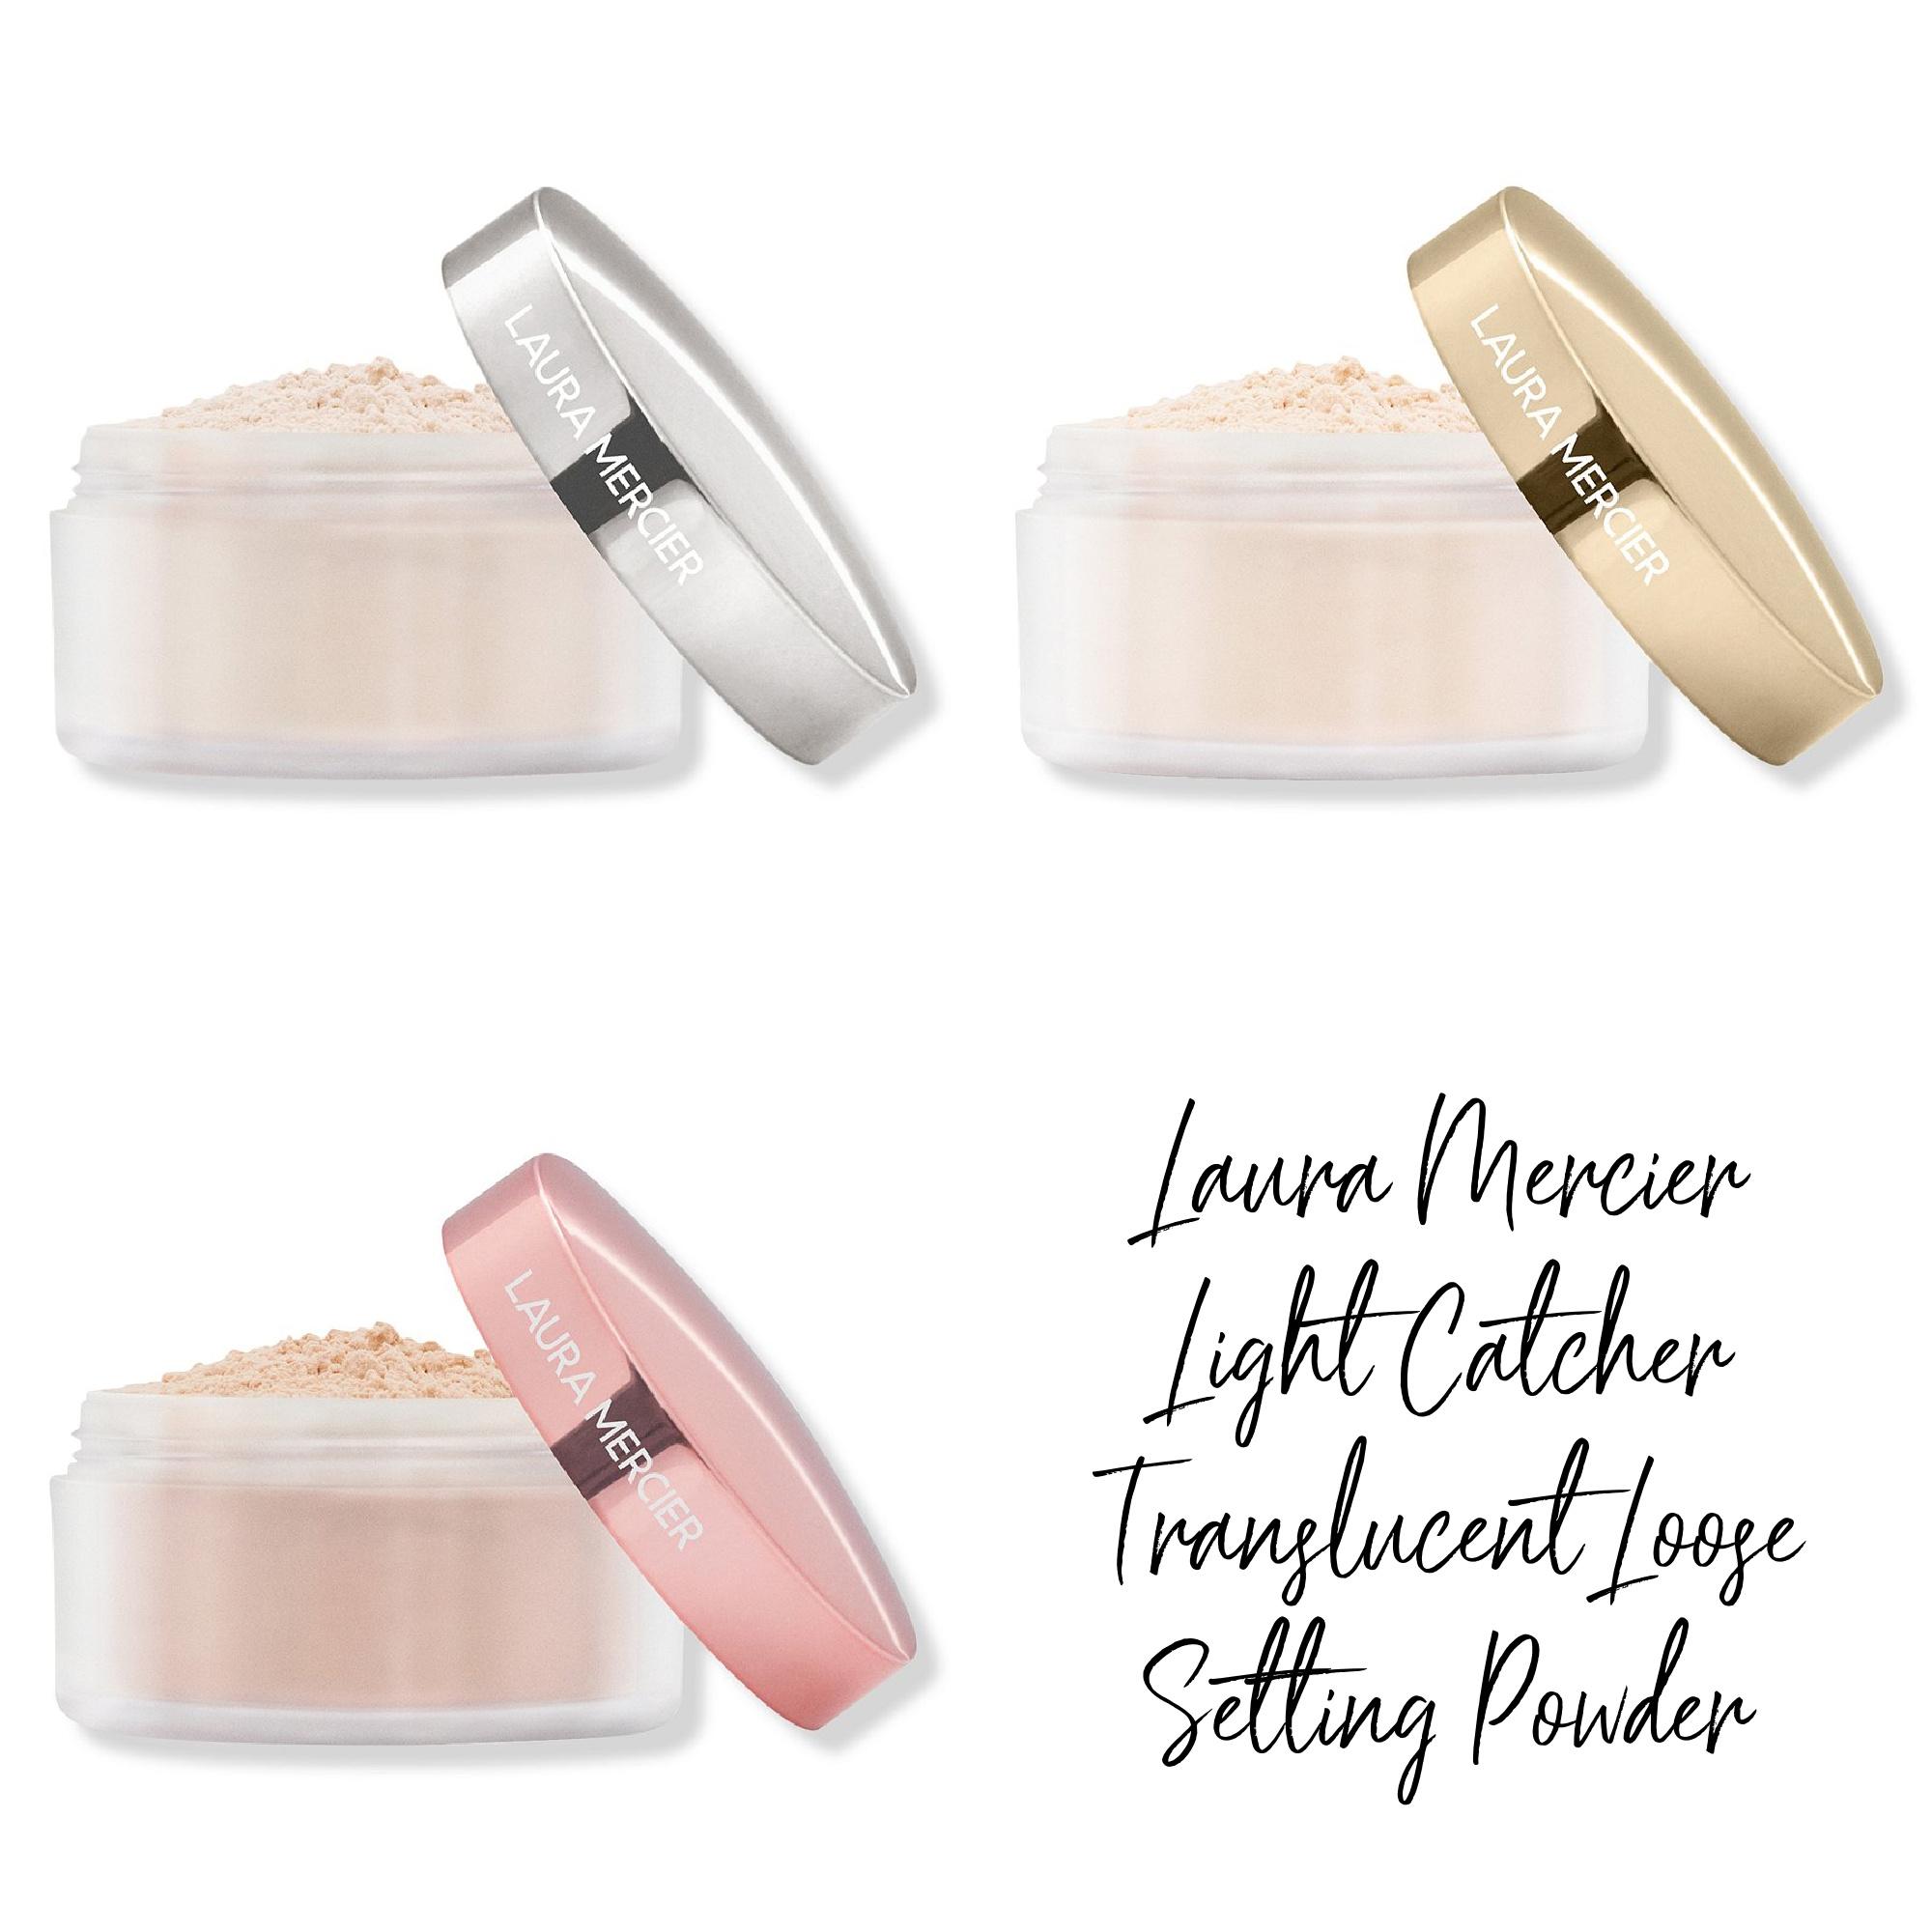 Laura Mercier Light Catcher Translucent Loose Setting Powder